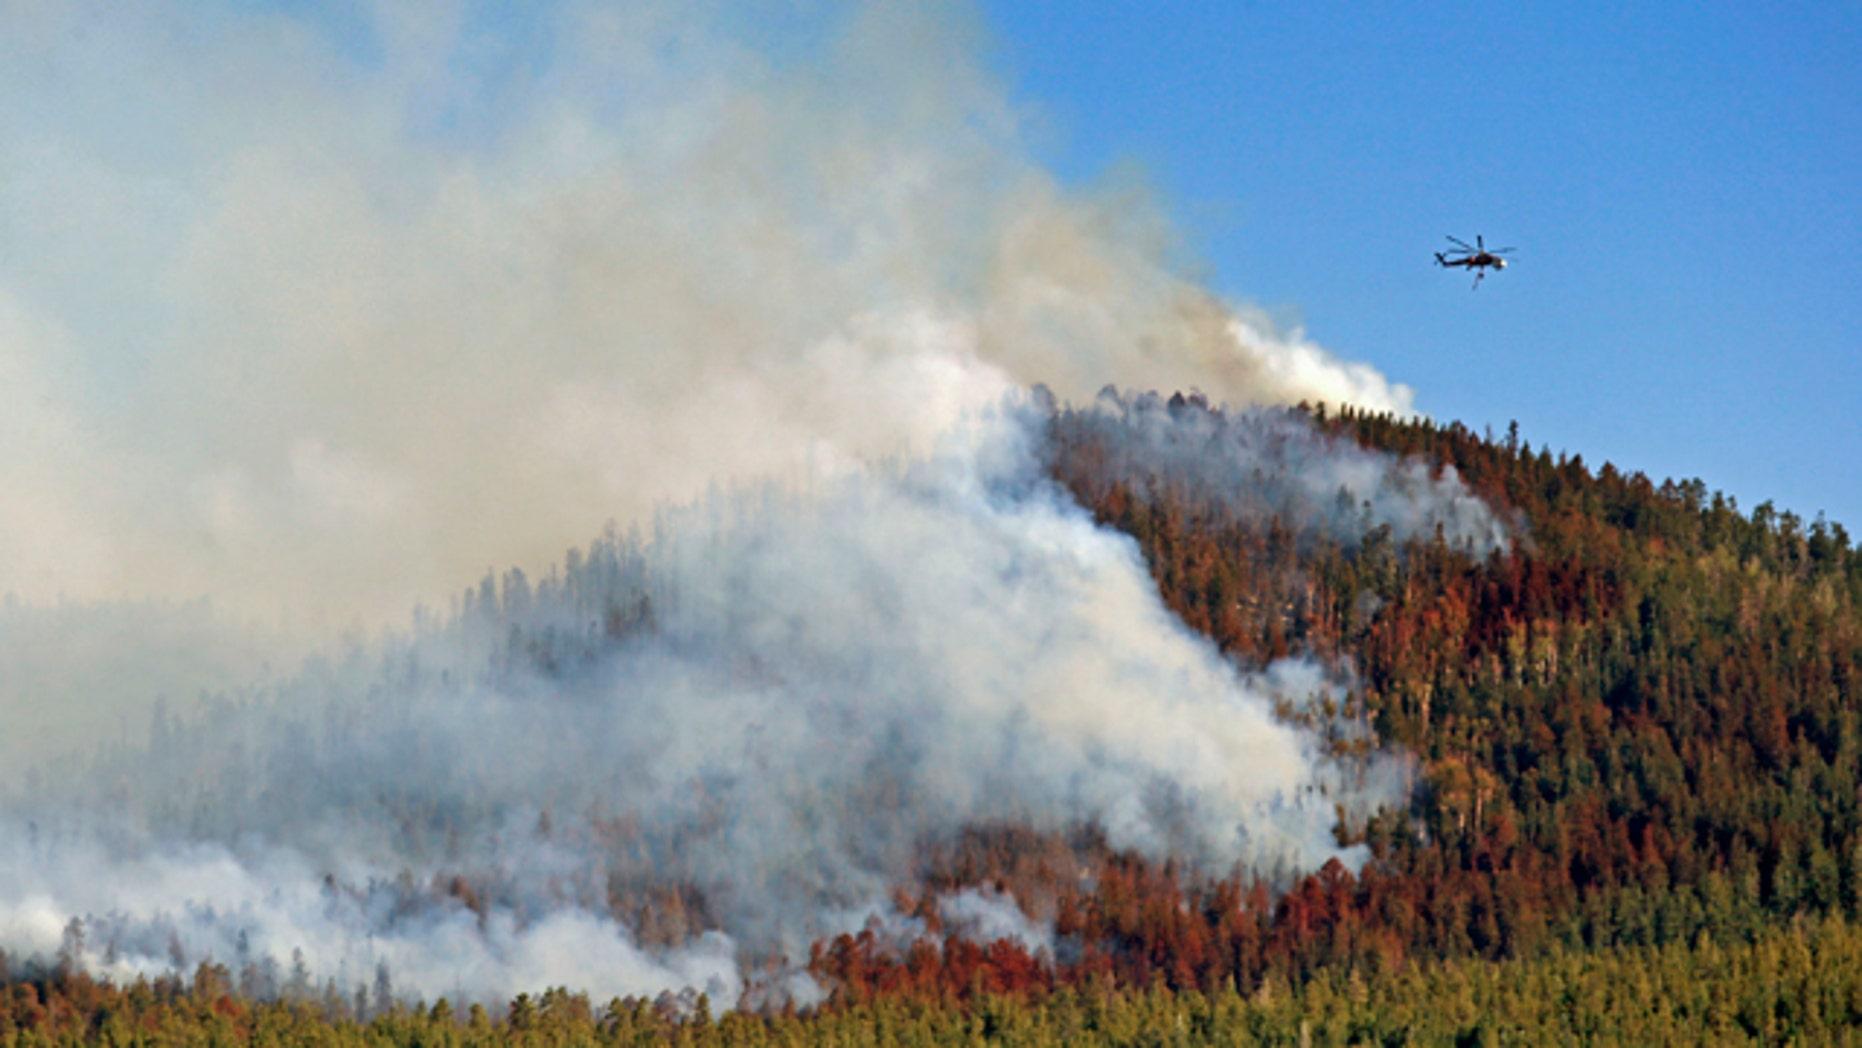 June 28, 2014: A helicopter hovers above the San Juan Fire in Vernon, Ariz.  (AP Photo/The Arizona Republic, David Kadlubowski)